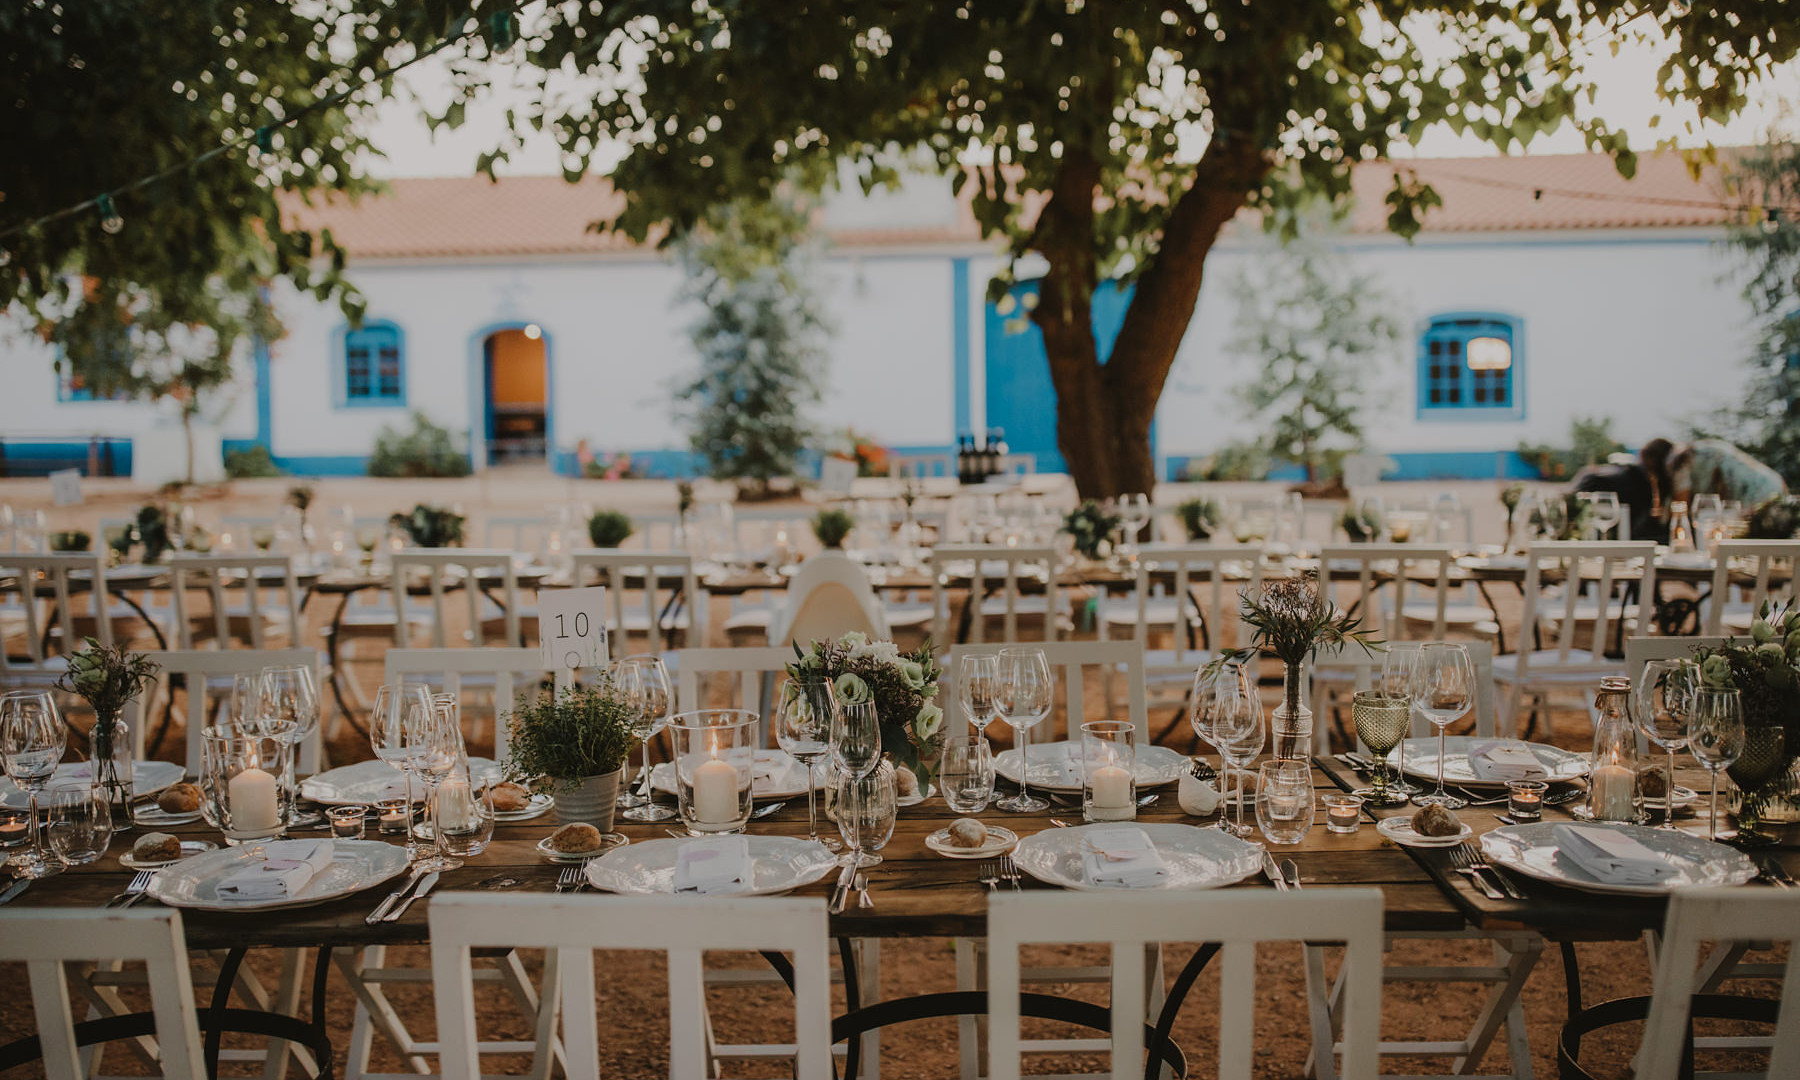 Authentic outdoor wedding dinner setting in Alentejo